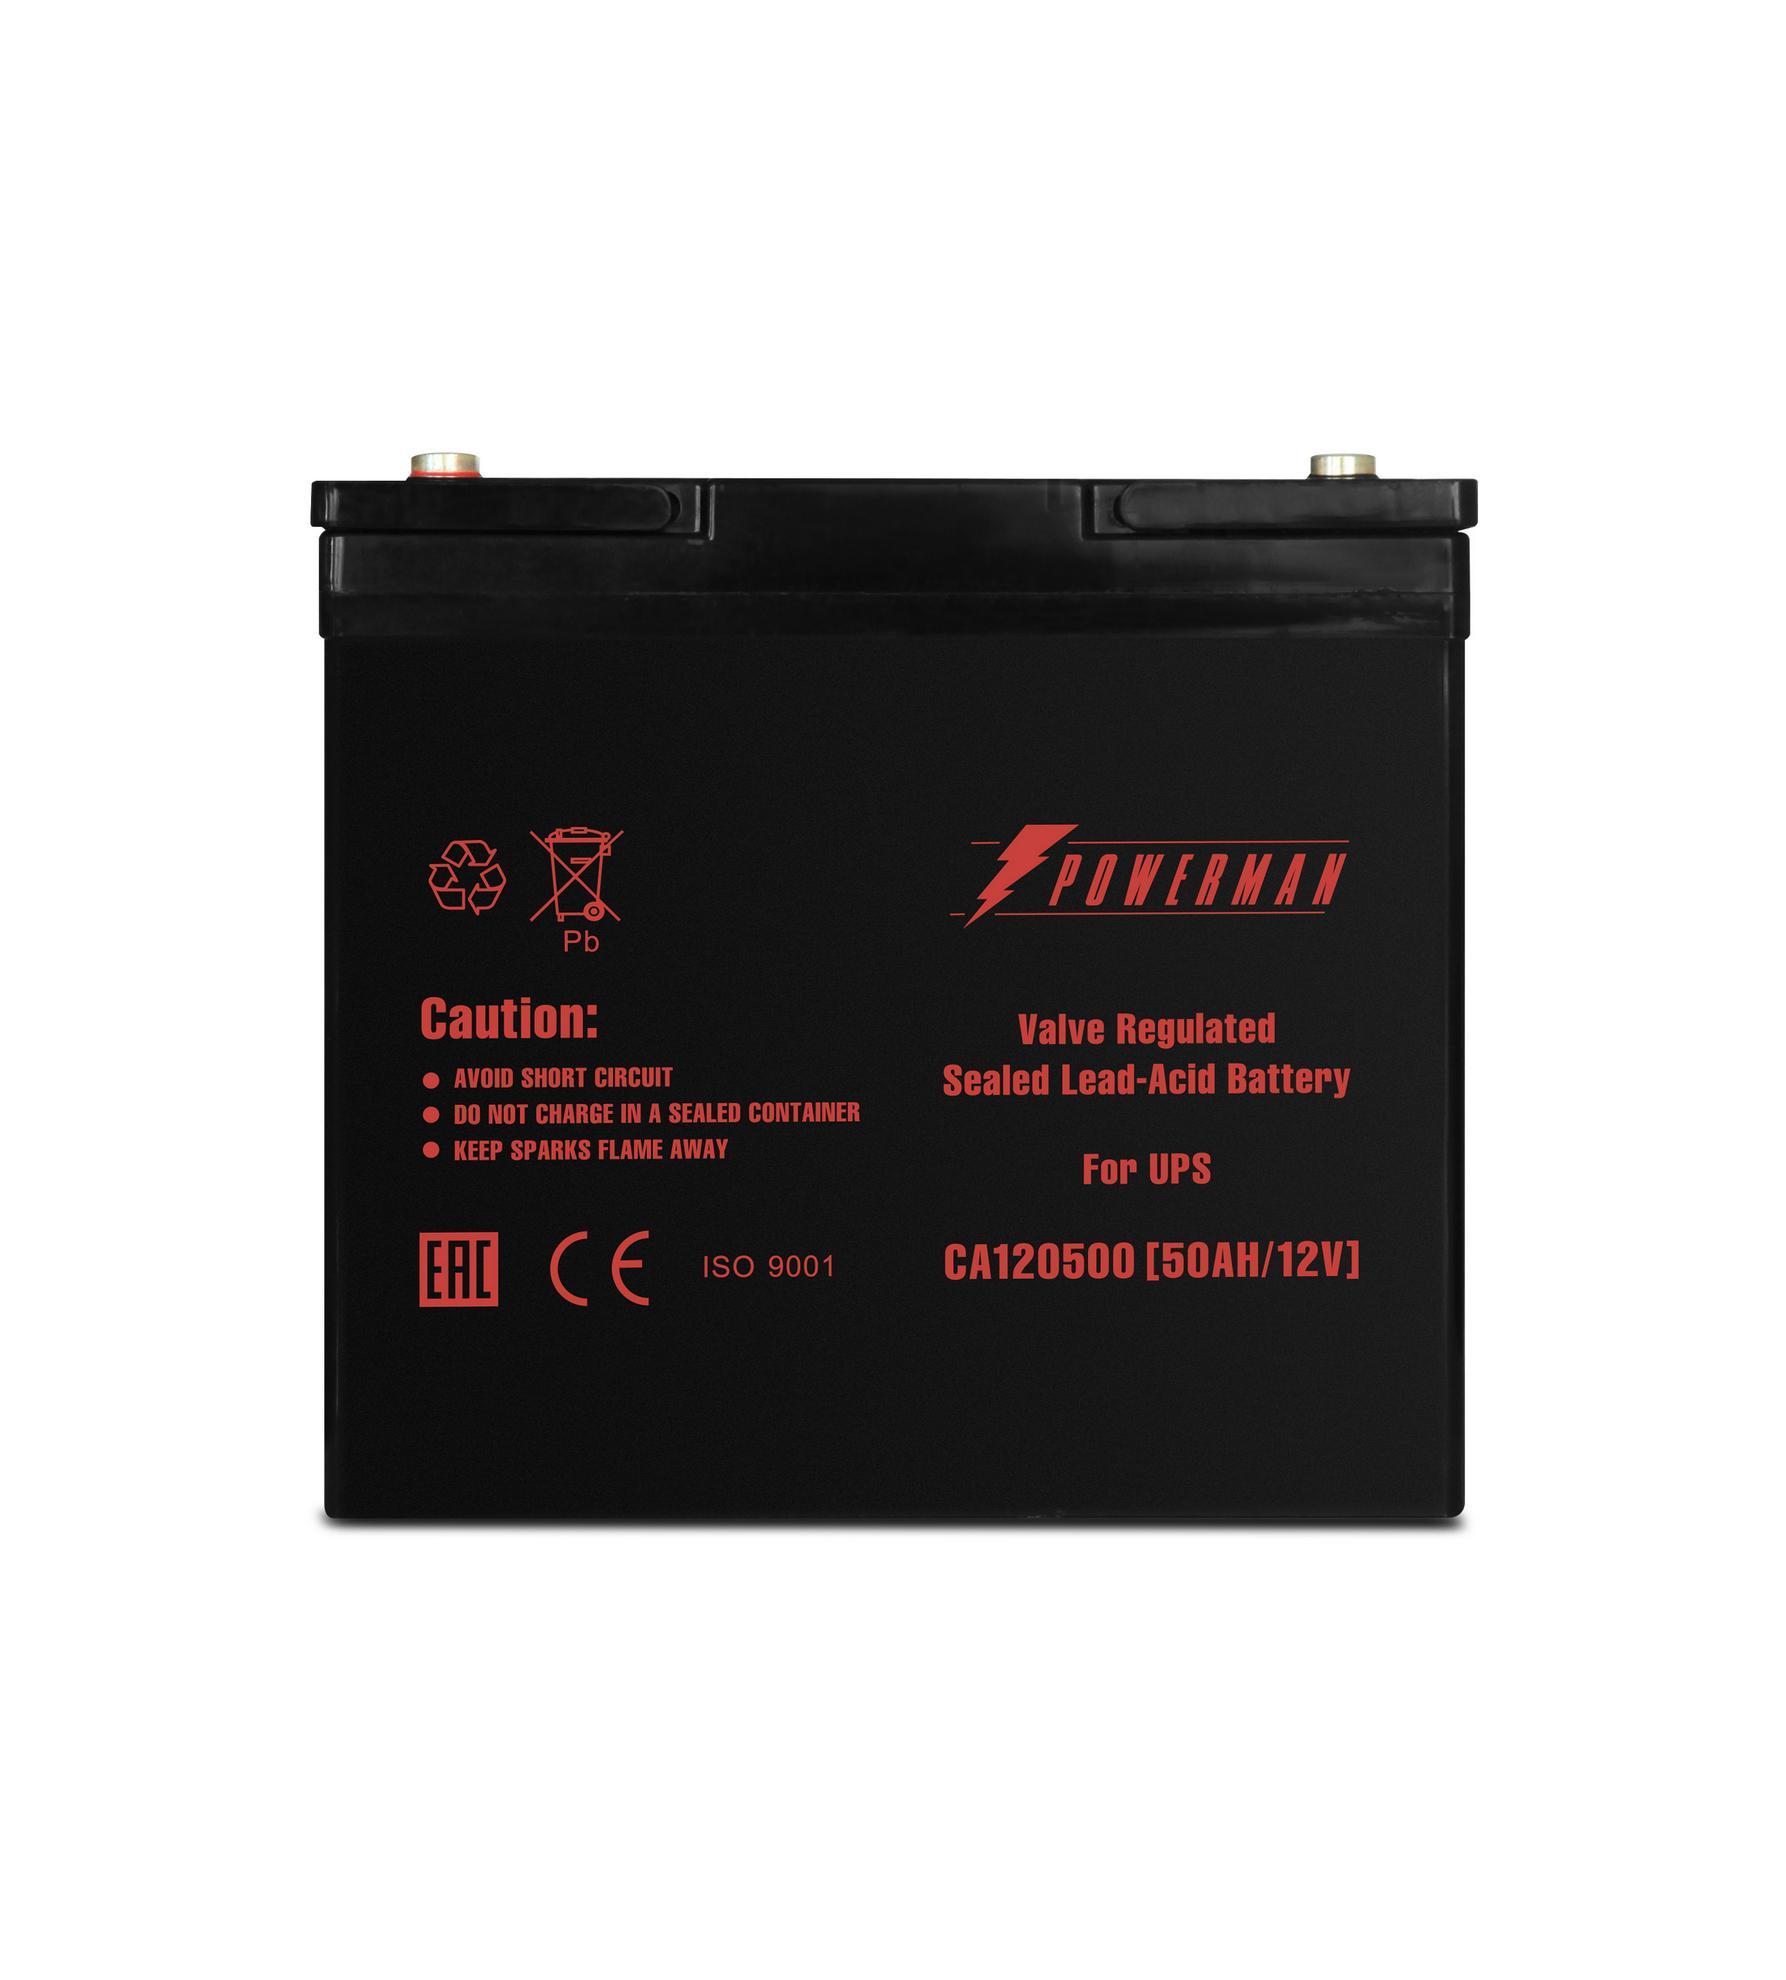 Аккумулятор для ИБП Powerman Ca12500/ups